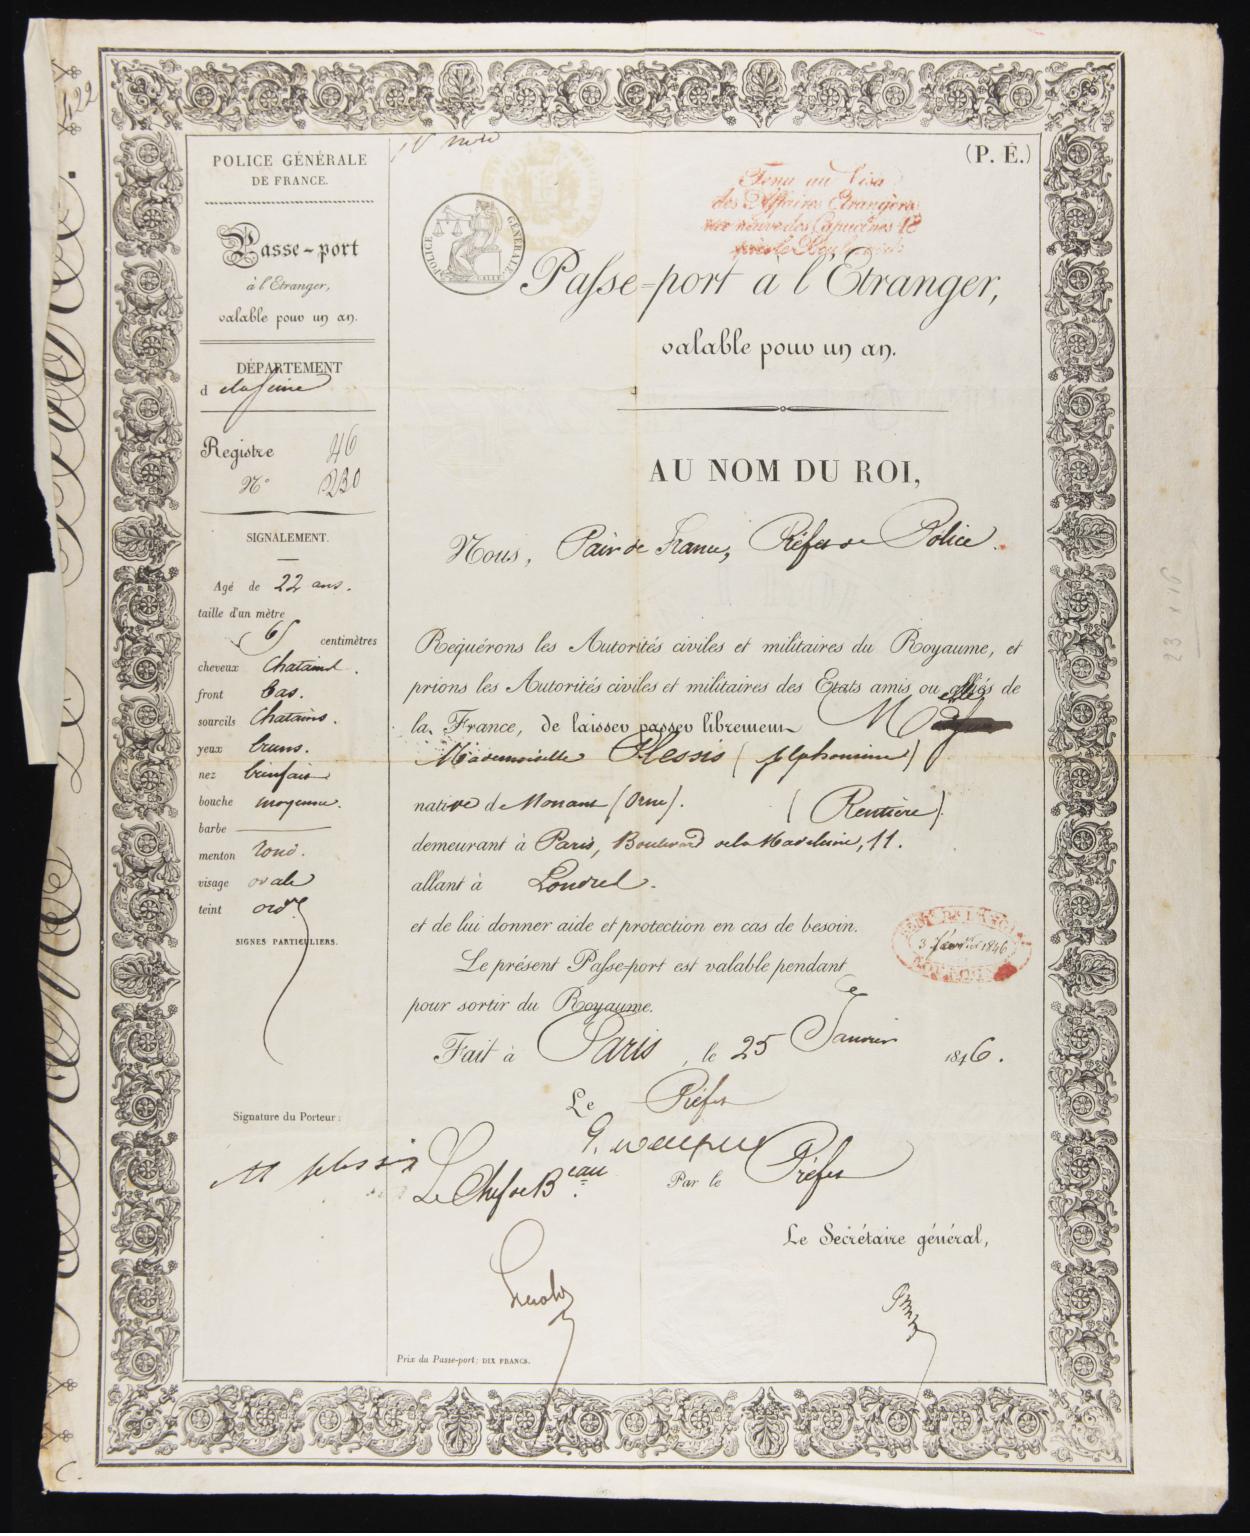 alphonsine plessis passport 1846.jpg